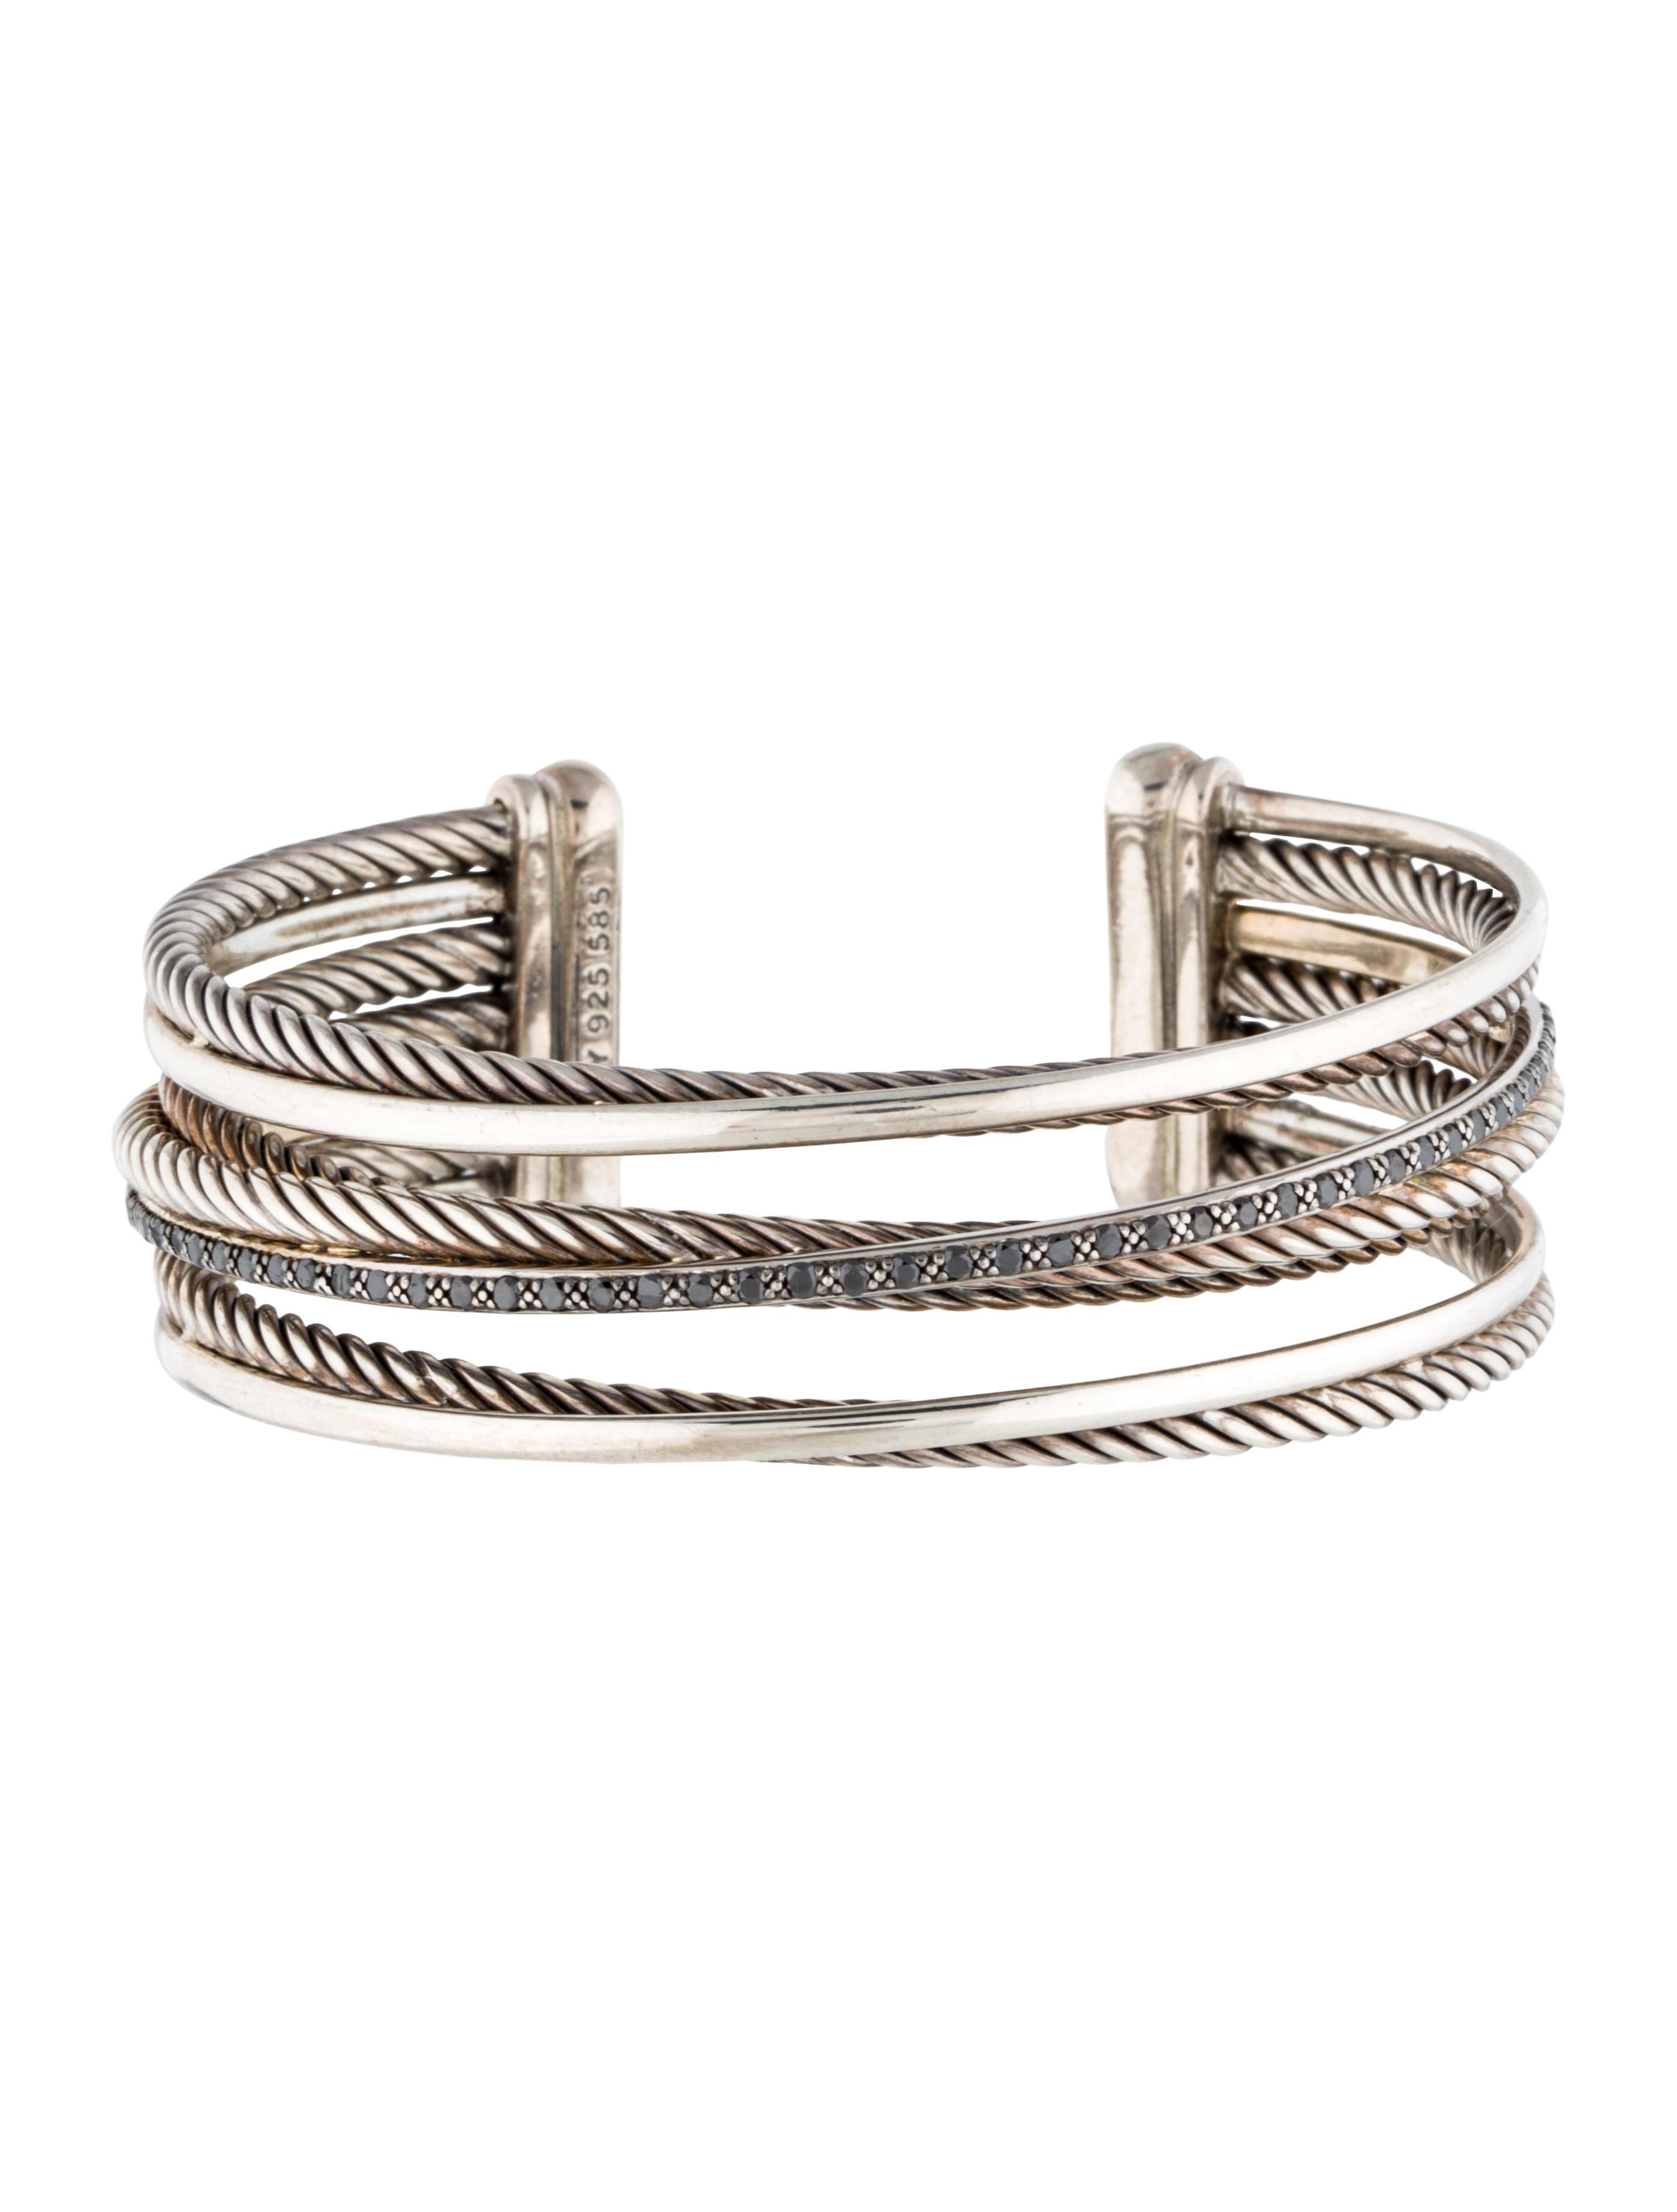 david yurman black diamond crossover cuff bracelets